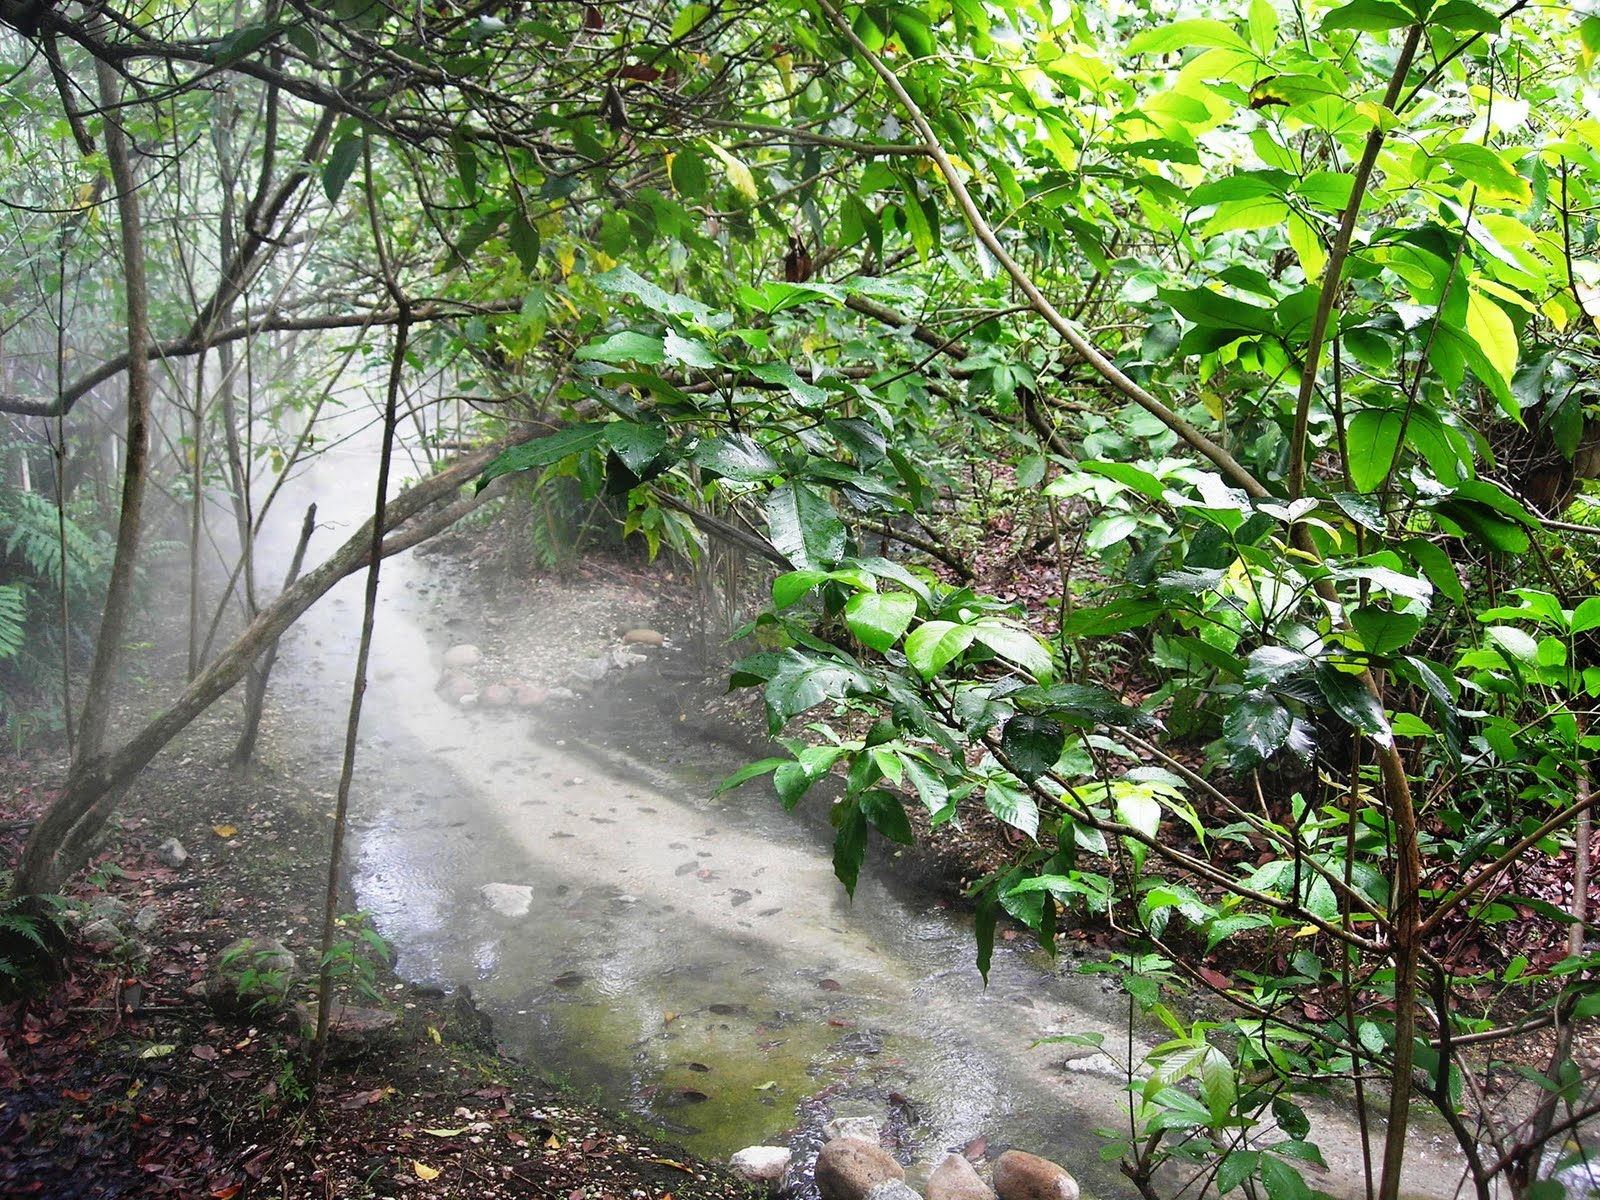 Sungai klah hot springs - The Steamy Stream